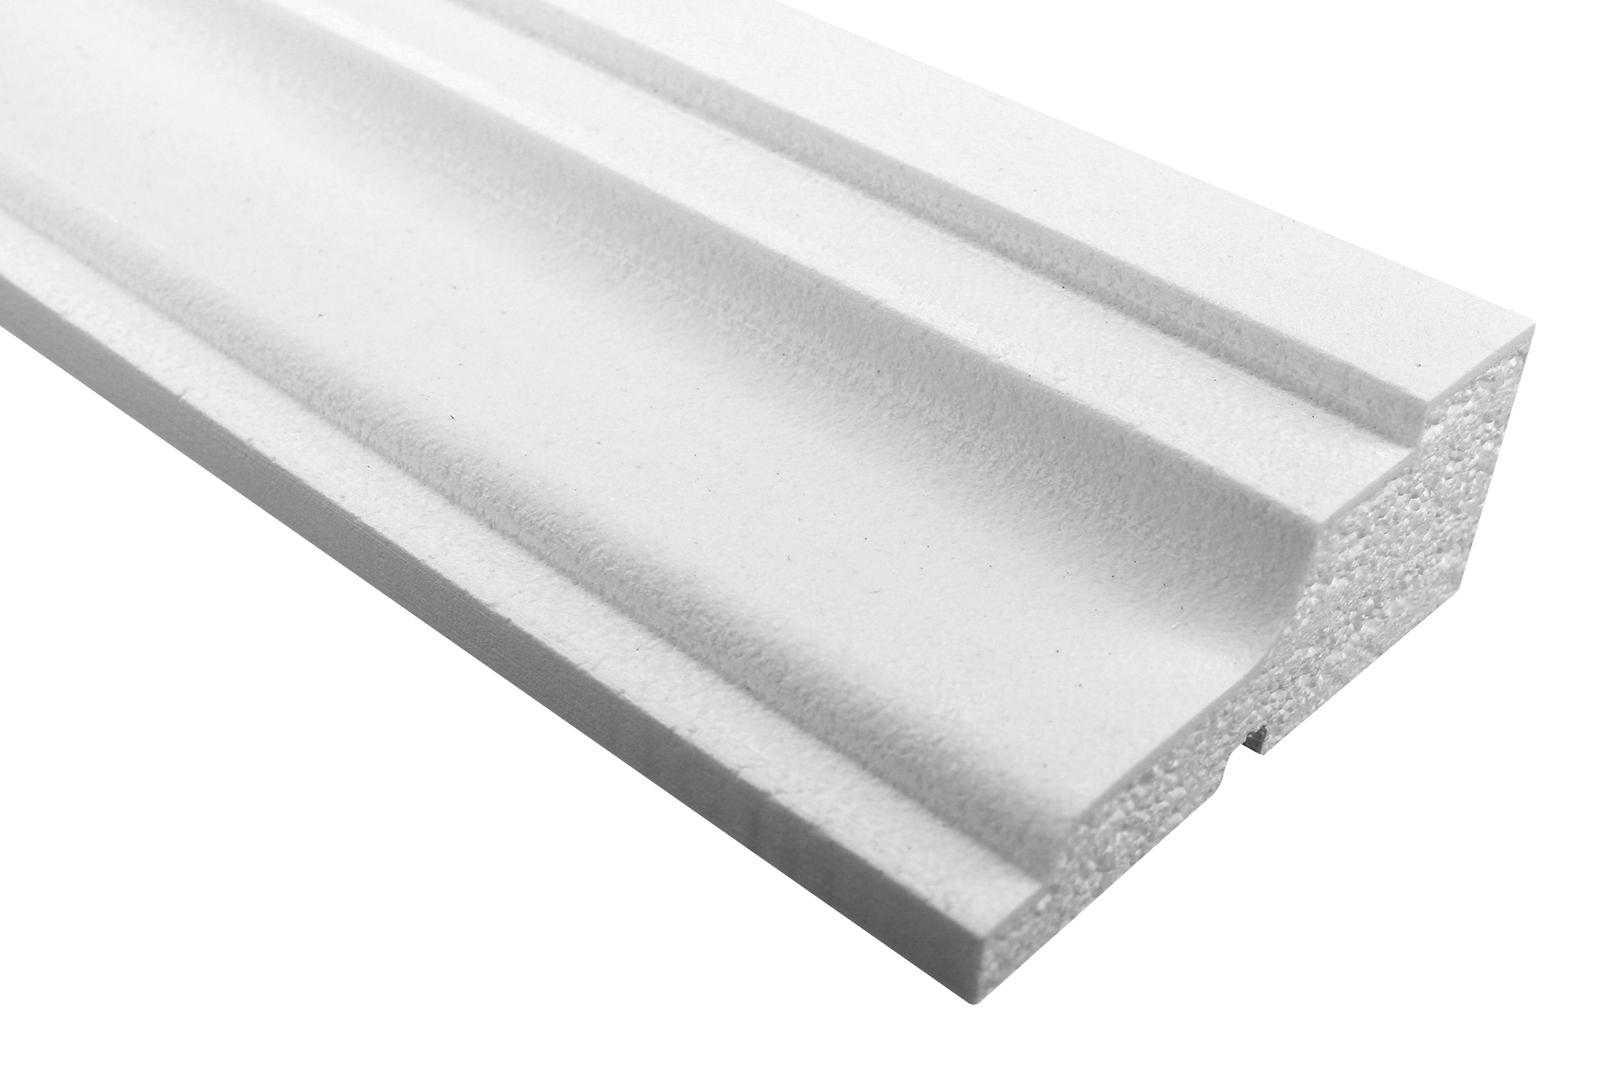 Fassade | Profile mit Ausprägung | EPS | PU |stoßfest |60x150mm | MC165